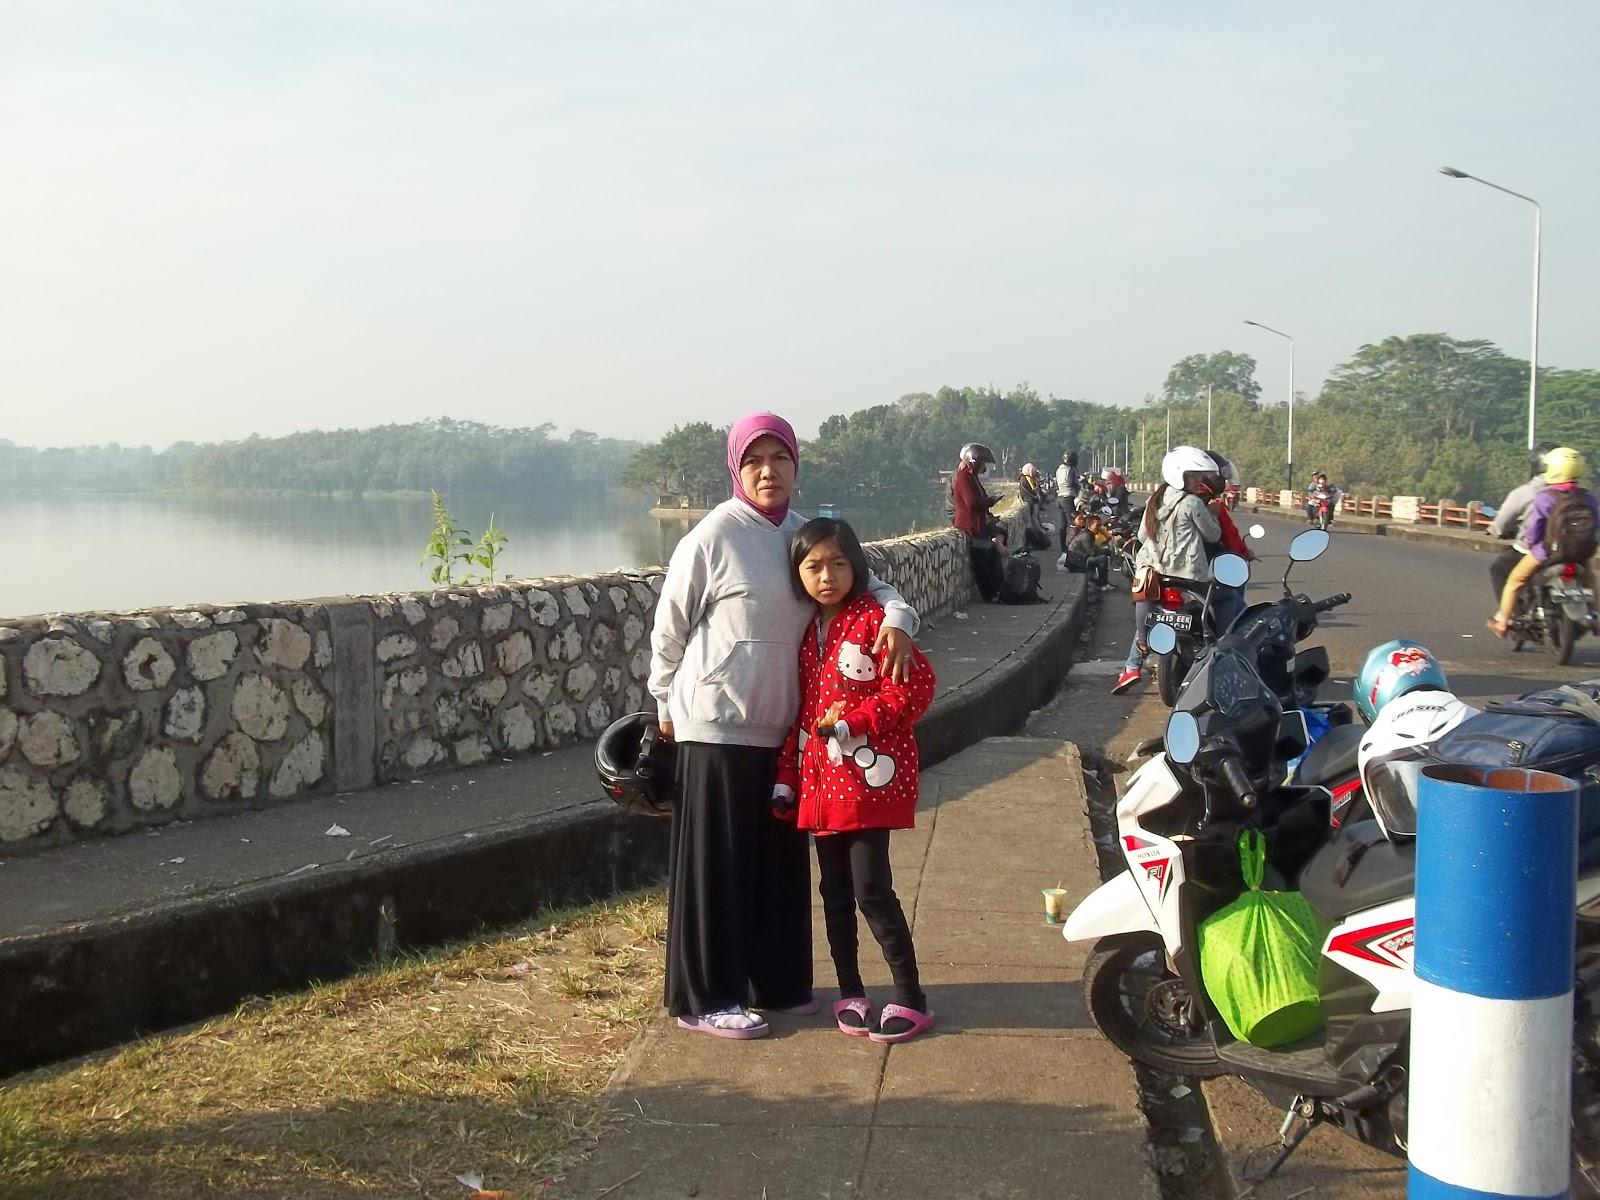 Bendungan Lahor Sumber Pucung Malang Jawa Timur Mobile